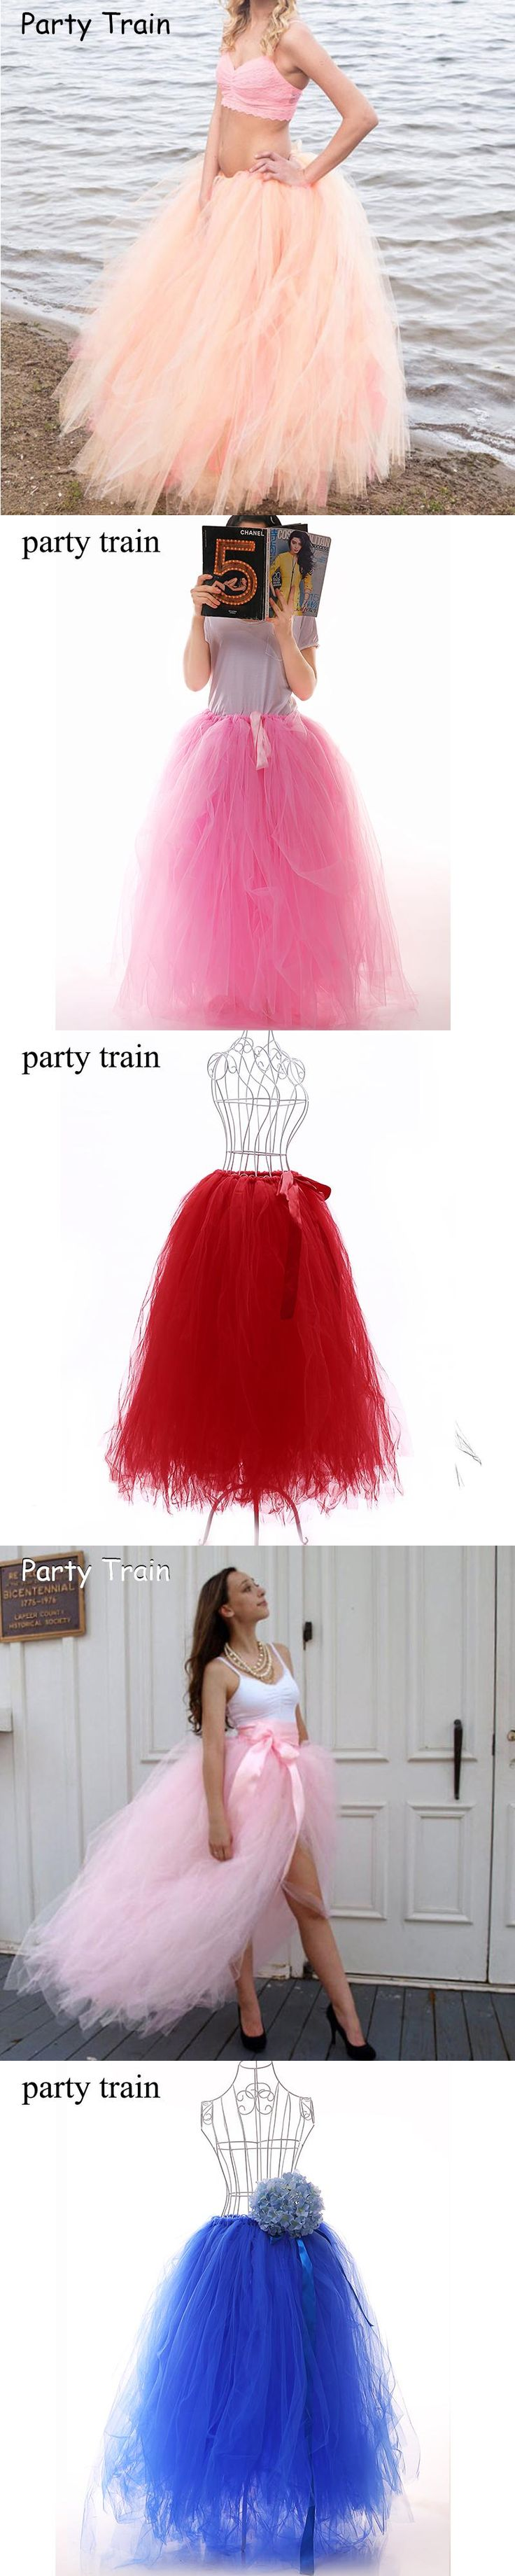 2017 100cm Long Tulle Skirt Girls Fluffy Chiffon Solid Colors Adult Tutu Skirts Womens Bridesmaids Dance Maxi Skirt Christmas